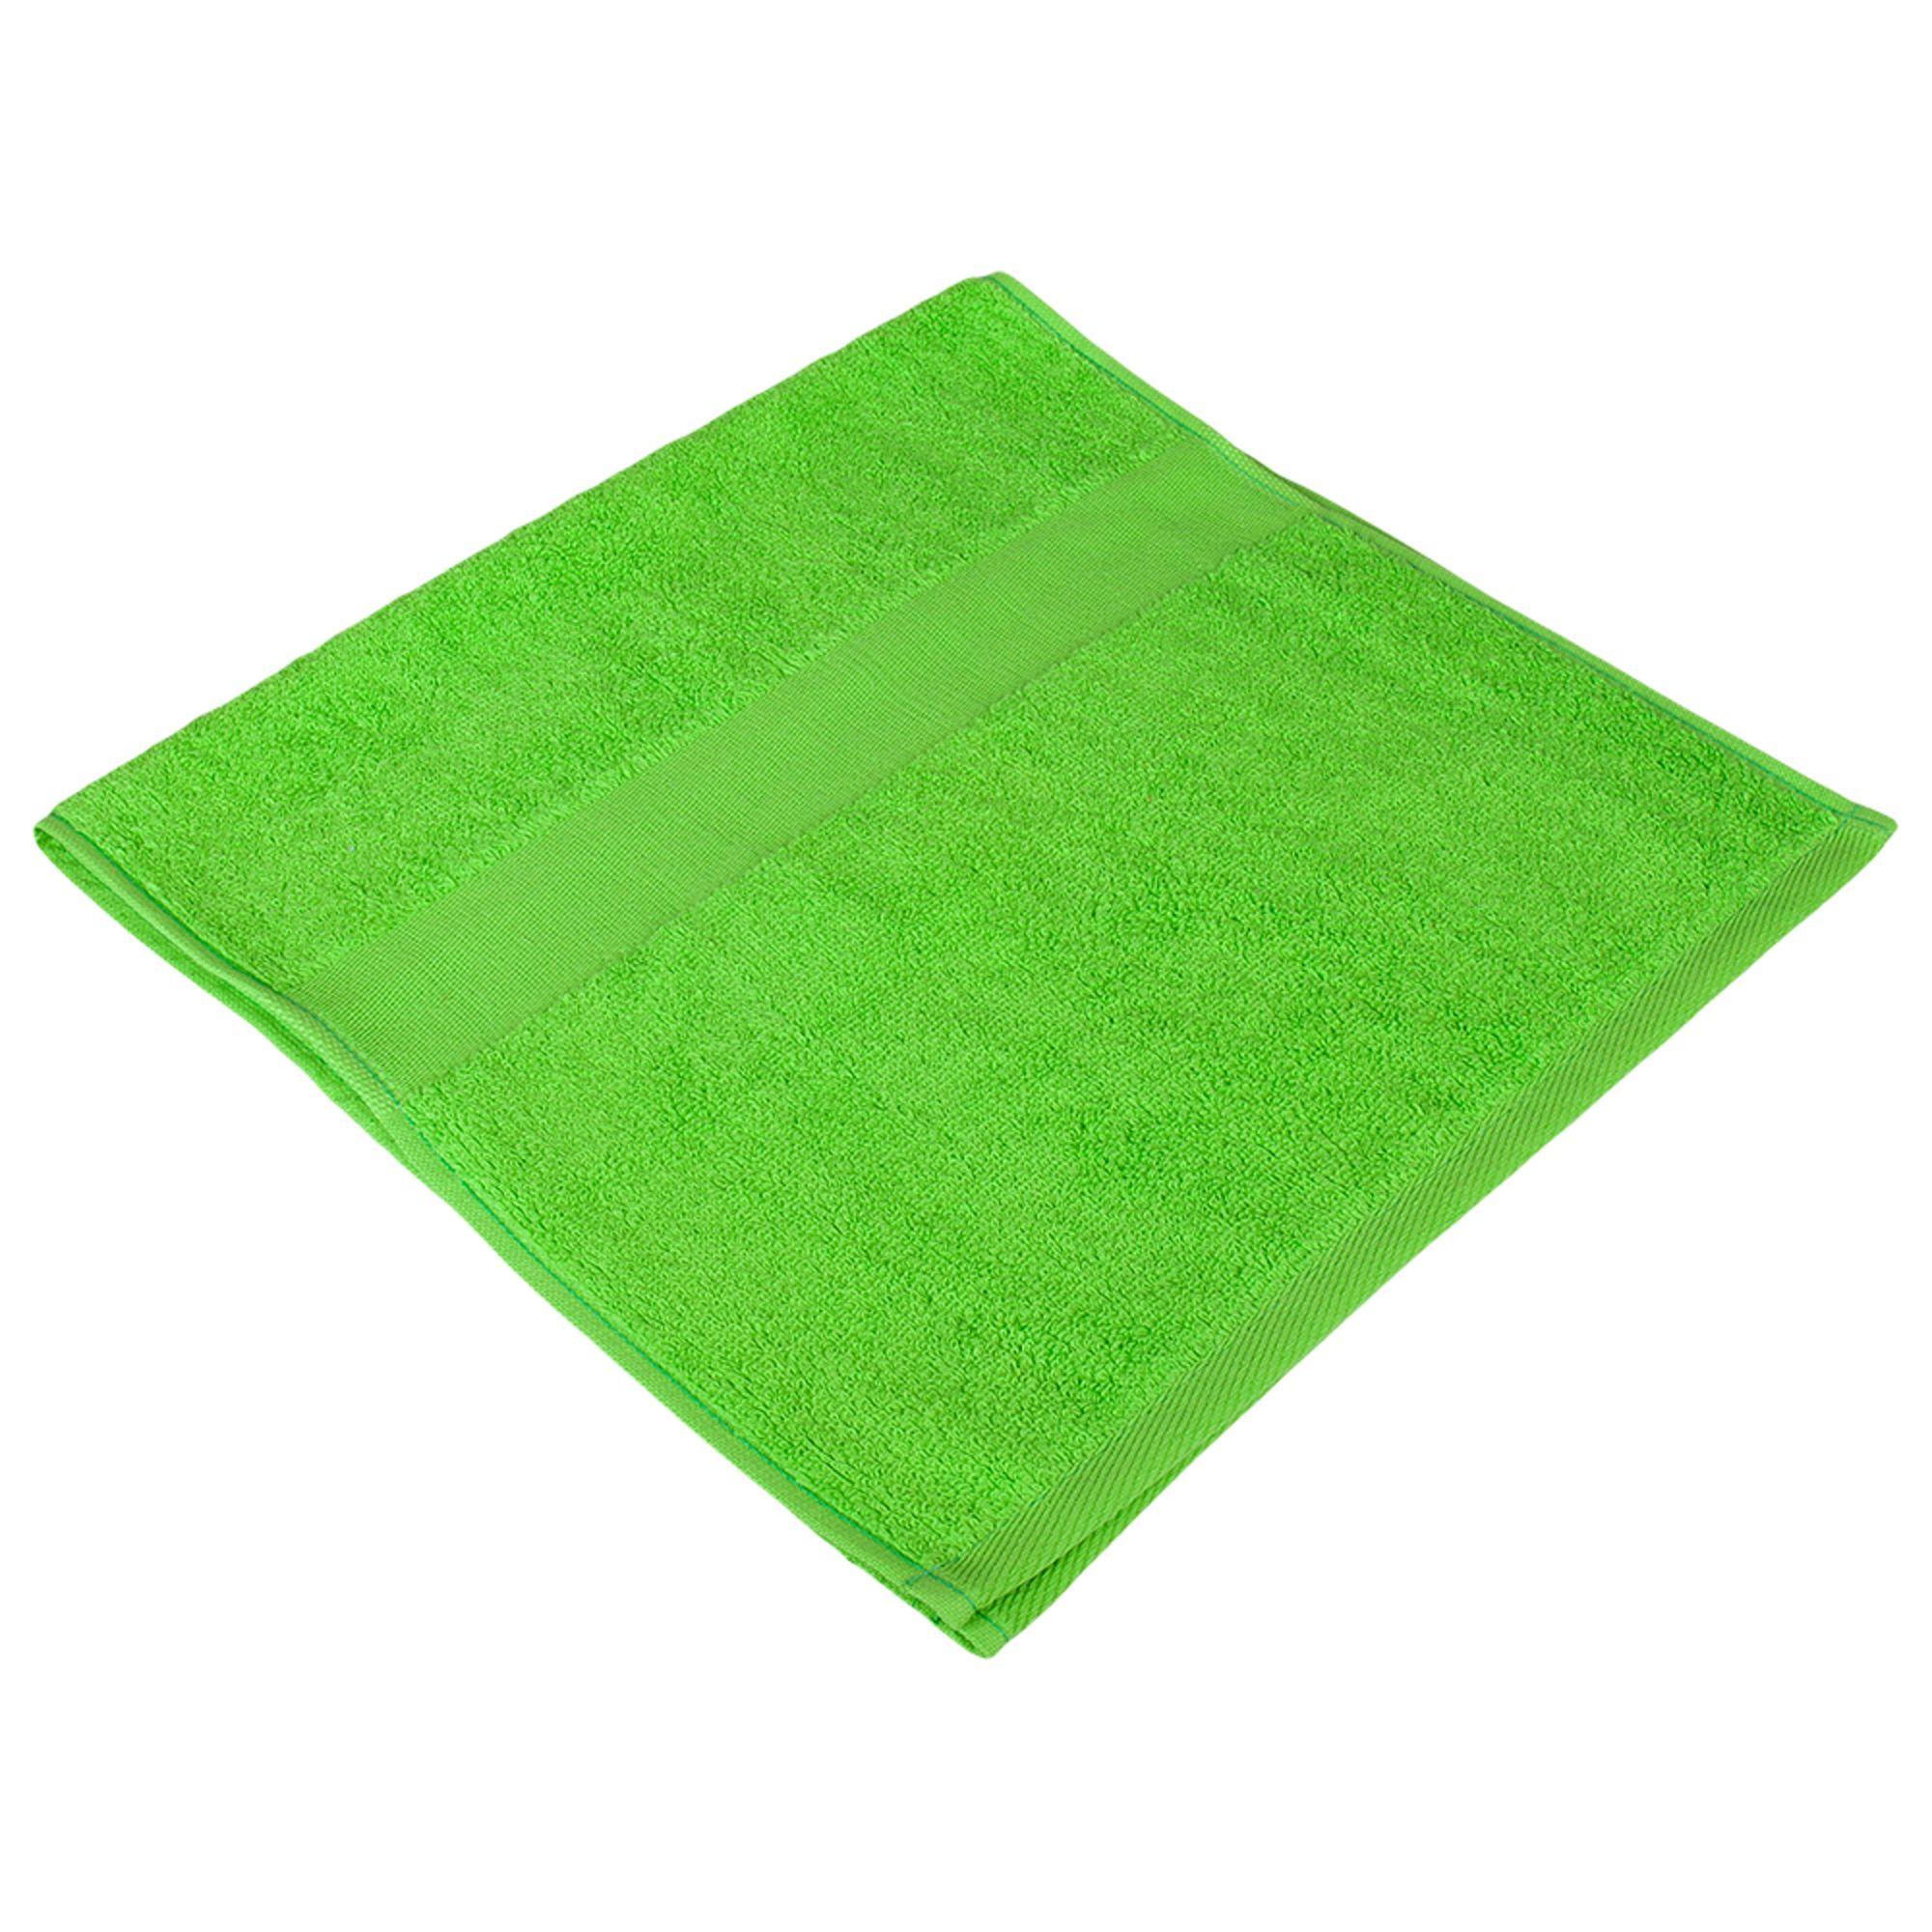 Полотенце махровое Small, зеленое яблоко